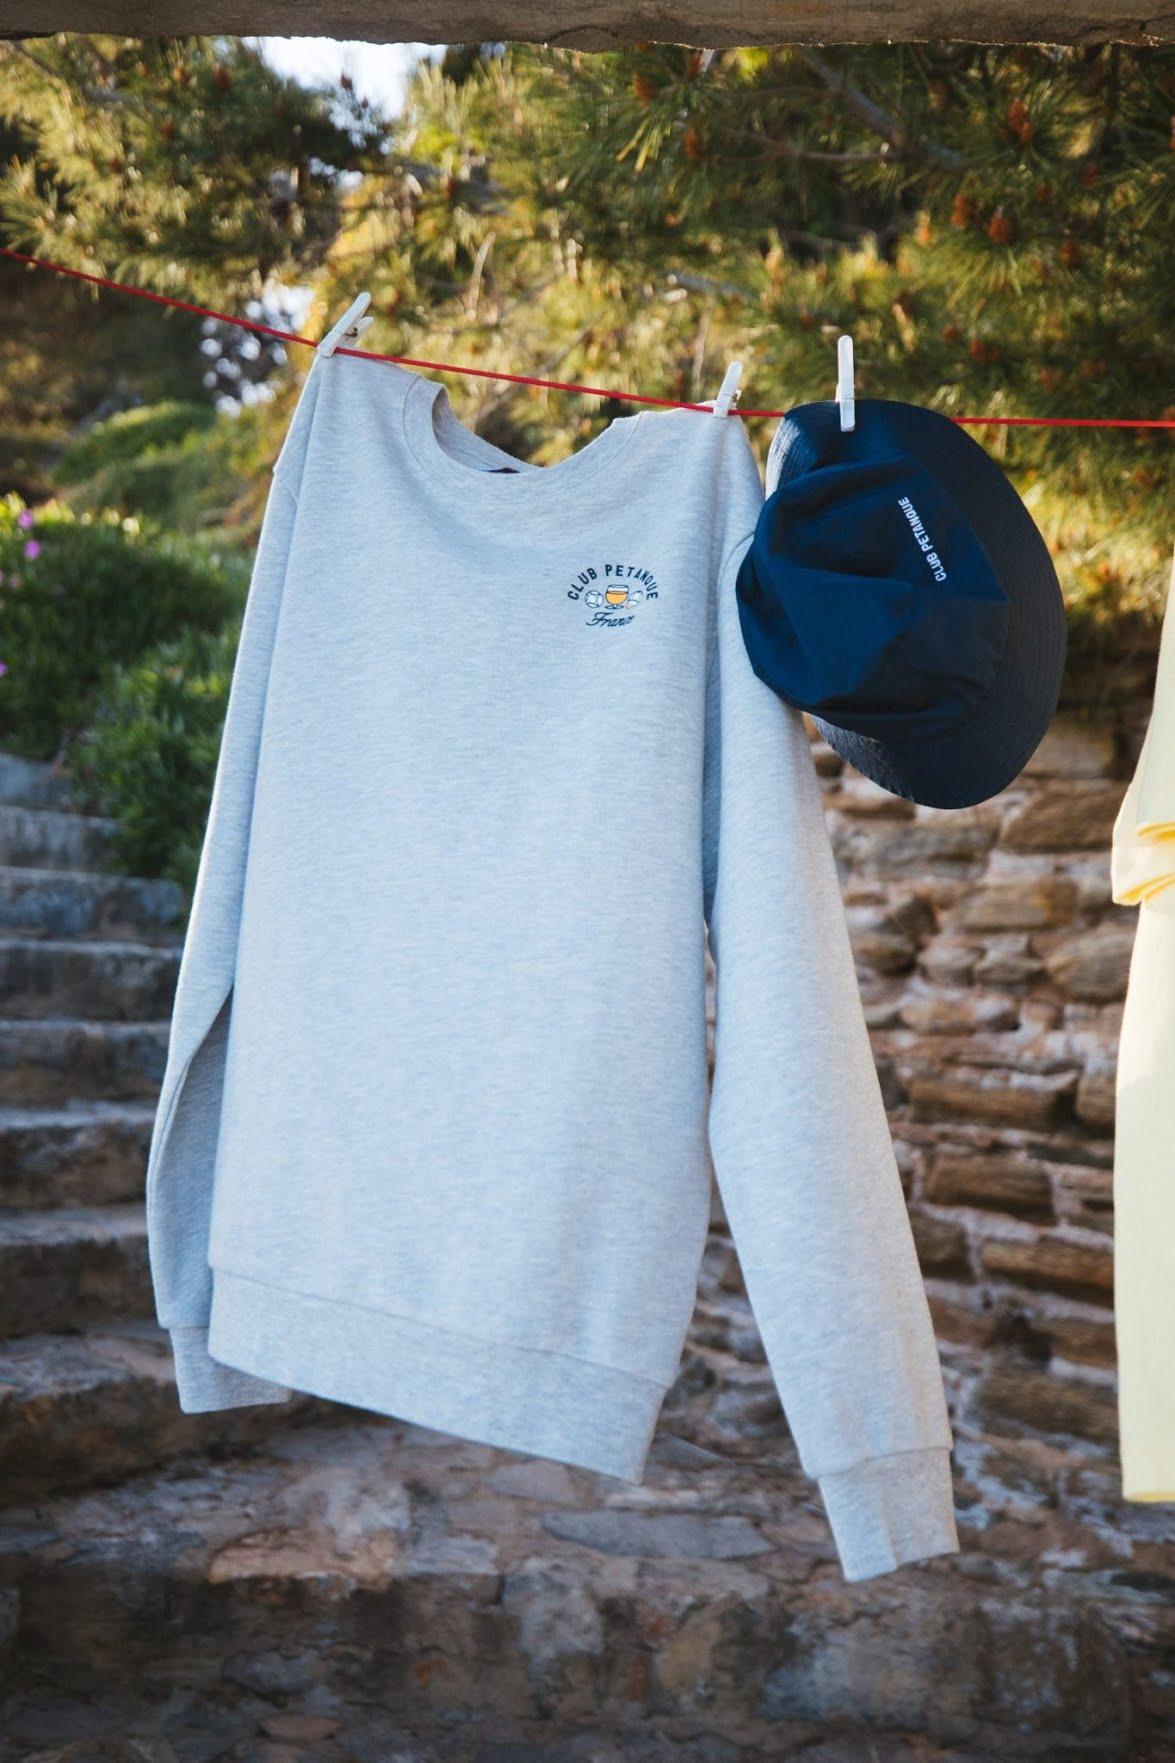 Sweat-shirt Jules x Club Pétanque